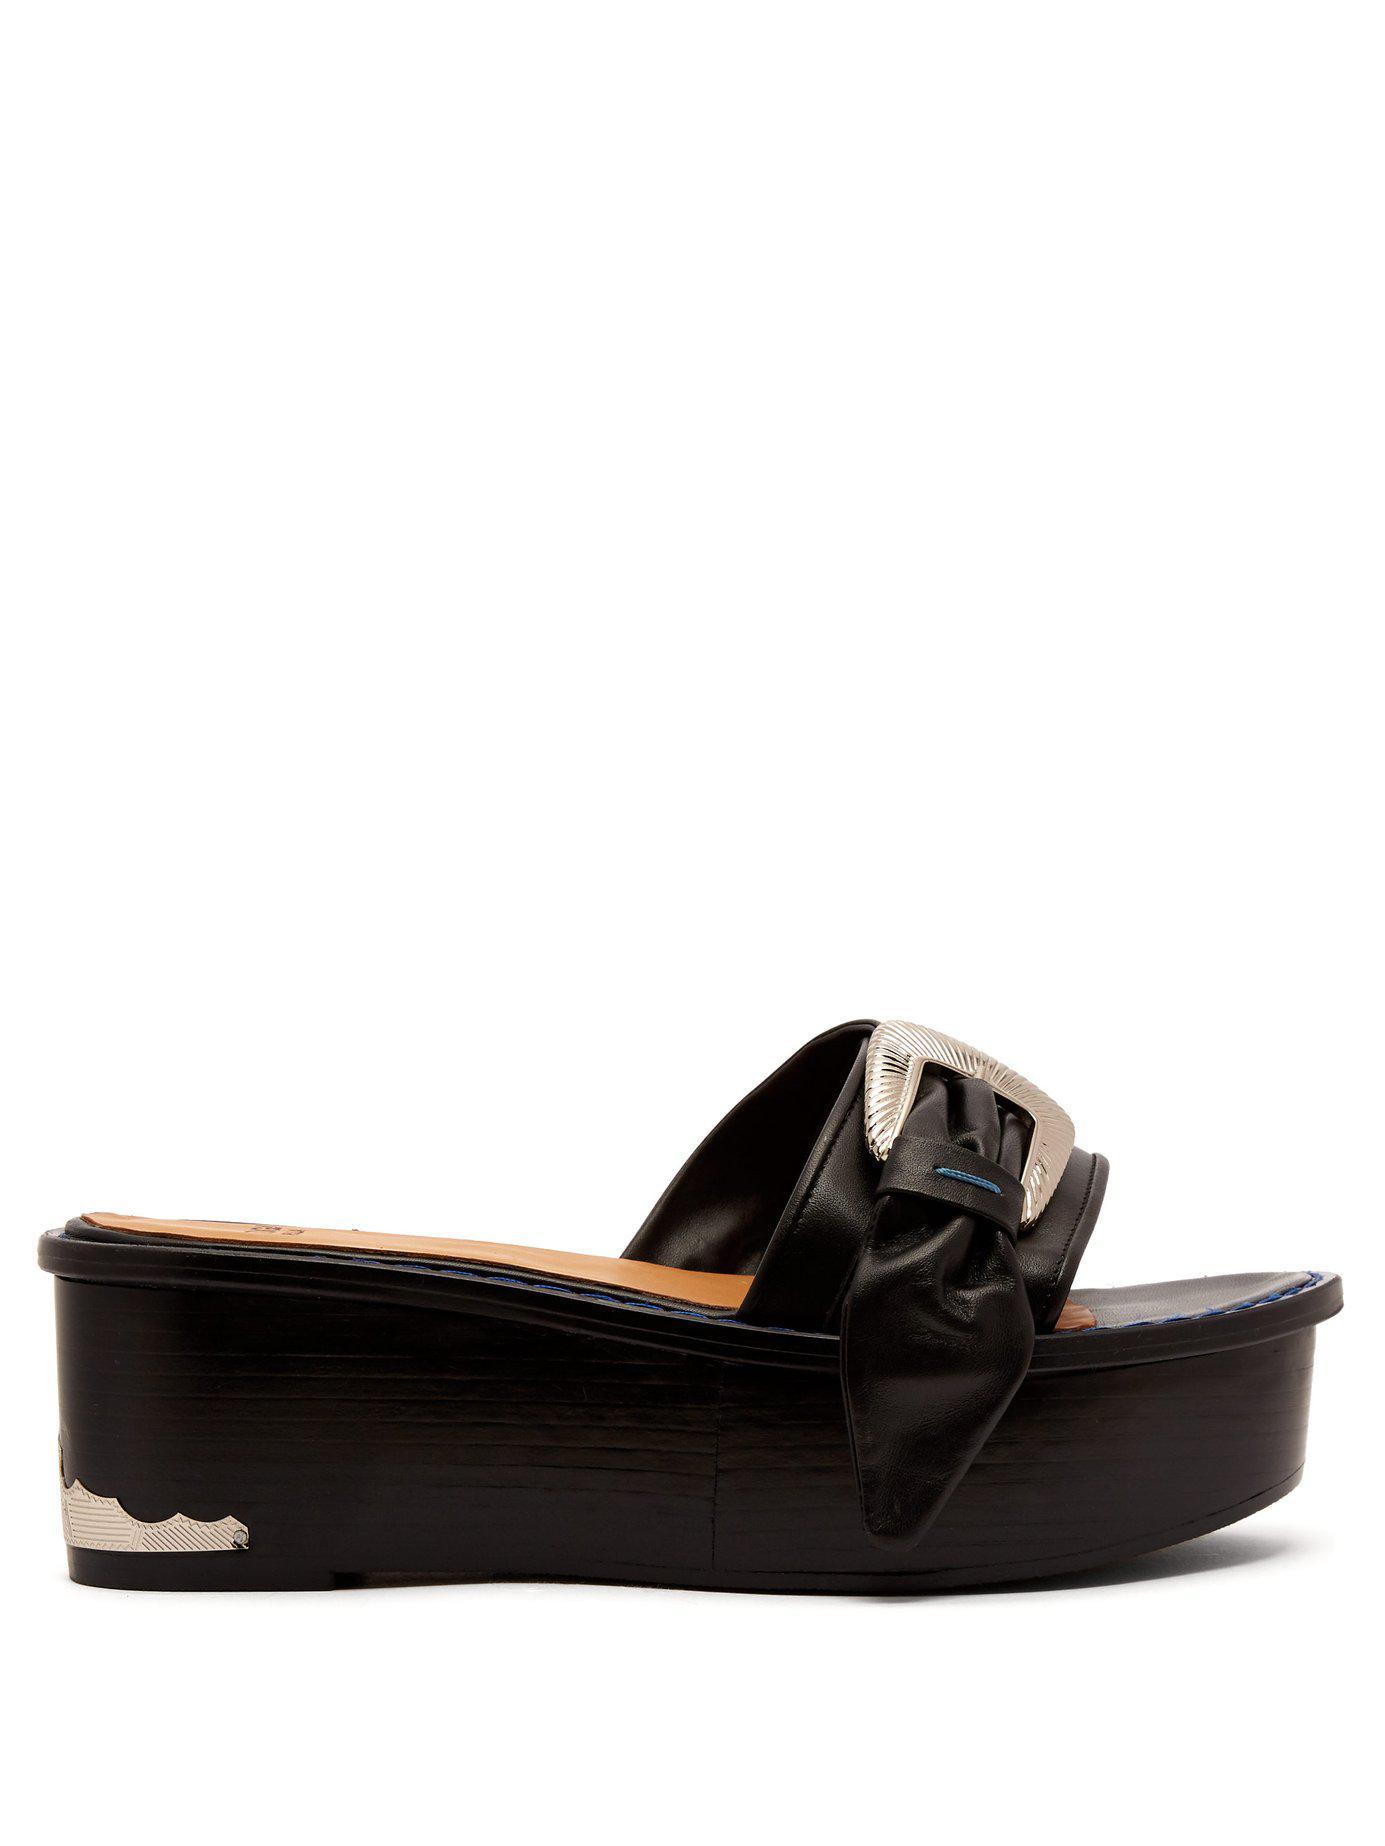 c4d002b69b6 Lyst - Toga Flatform Leather Sandals in Black